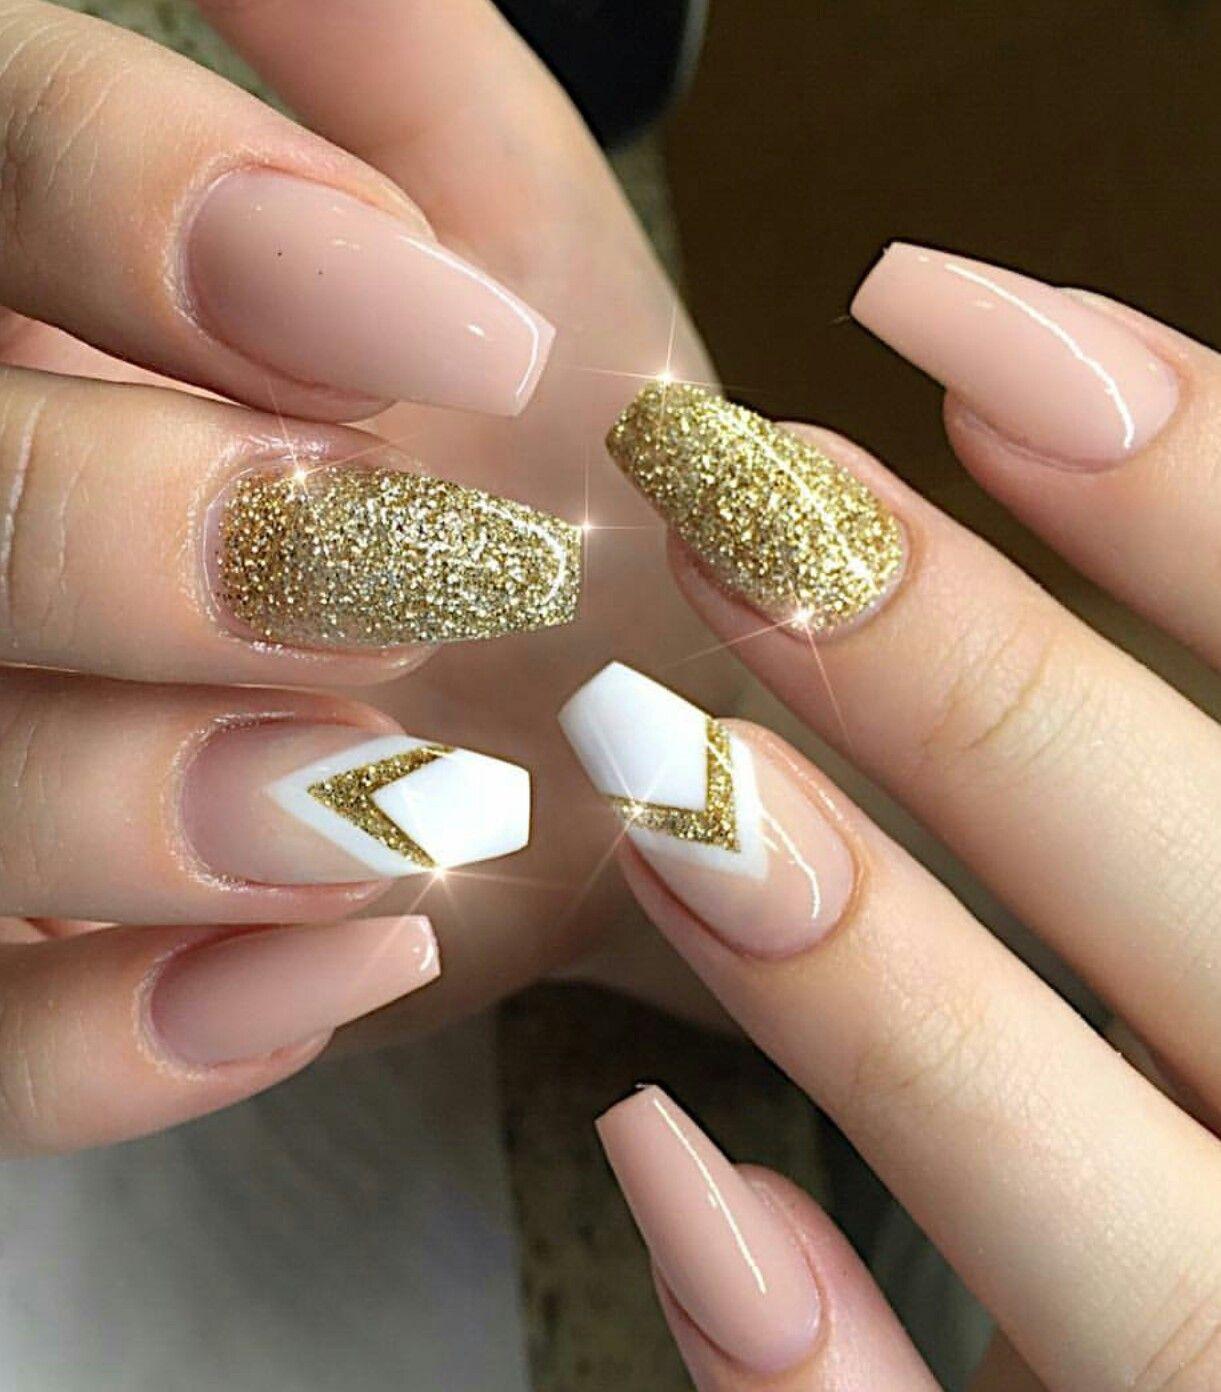 Pin by Kaye on Nails | Pinterest | Coffin nails